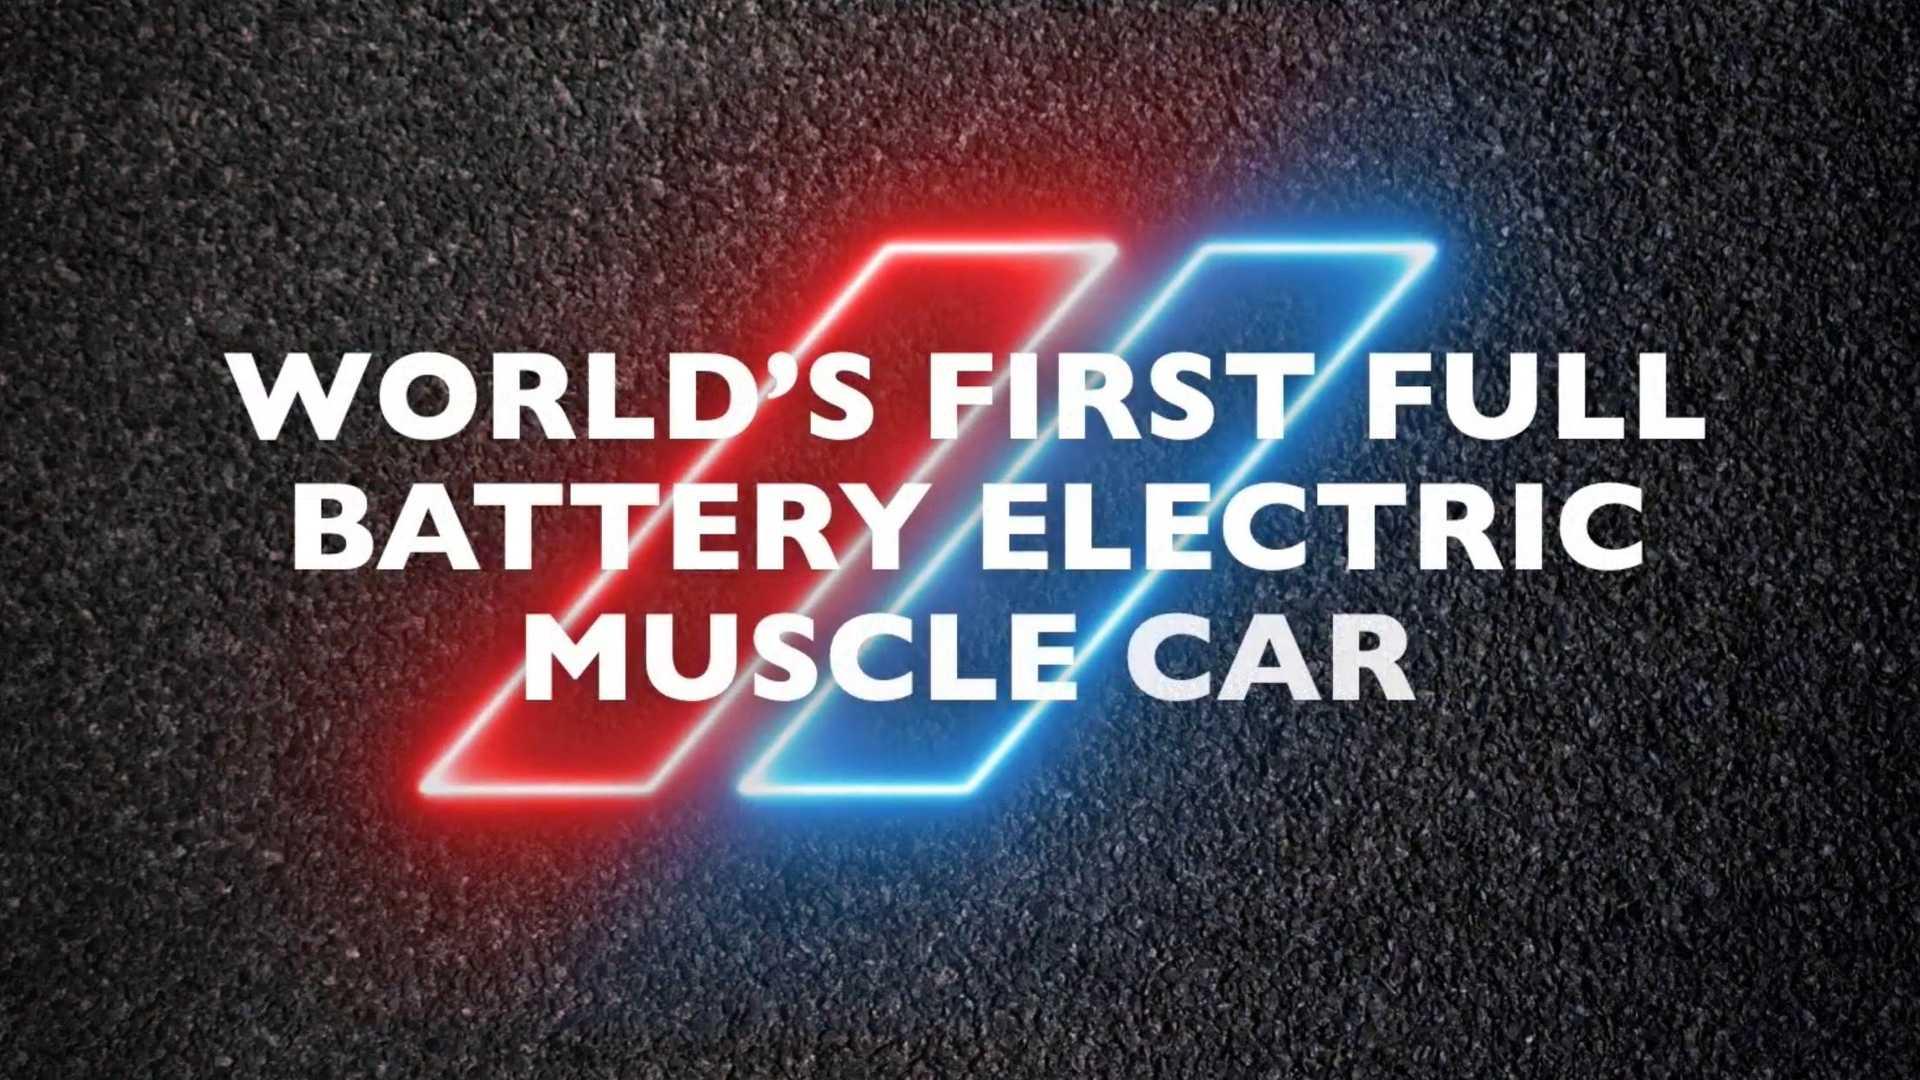 dodge-electric-muscle-car-teaser-claim.jpg